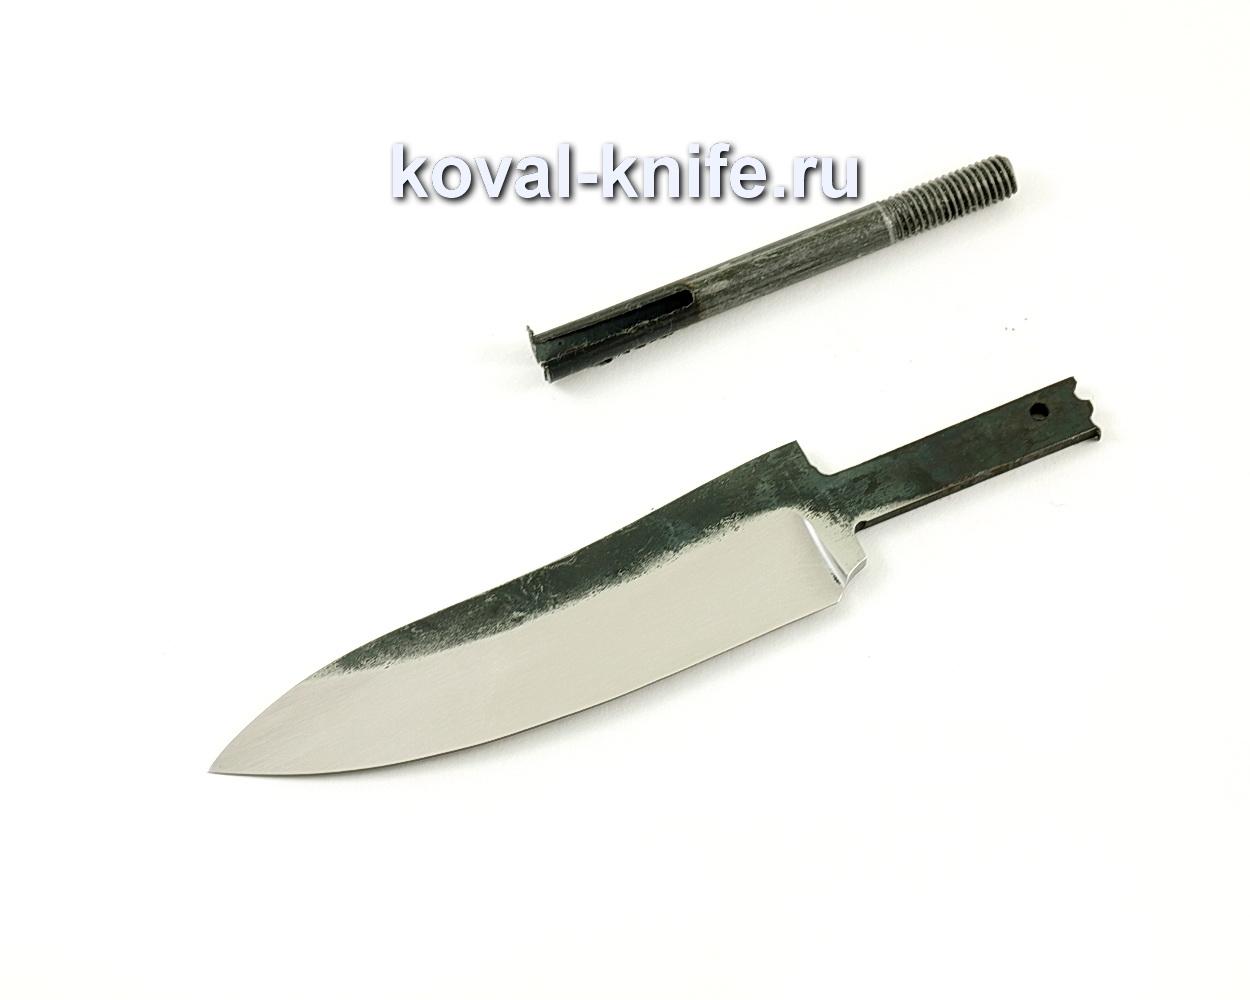 Клинок для ножа Лань (кованая сталь 110Х18 МШД)